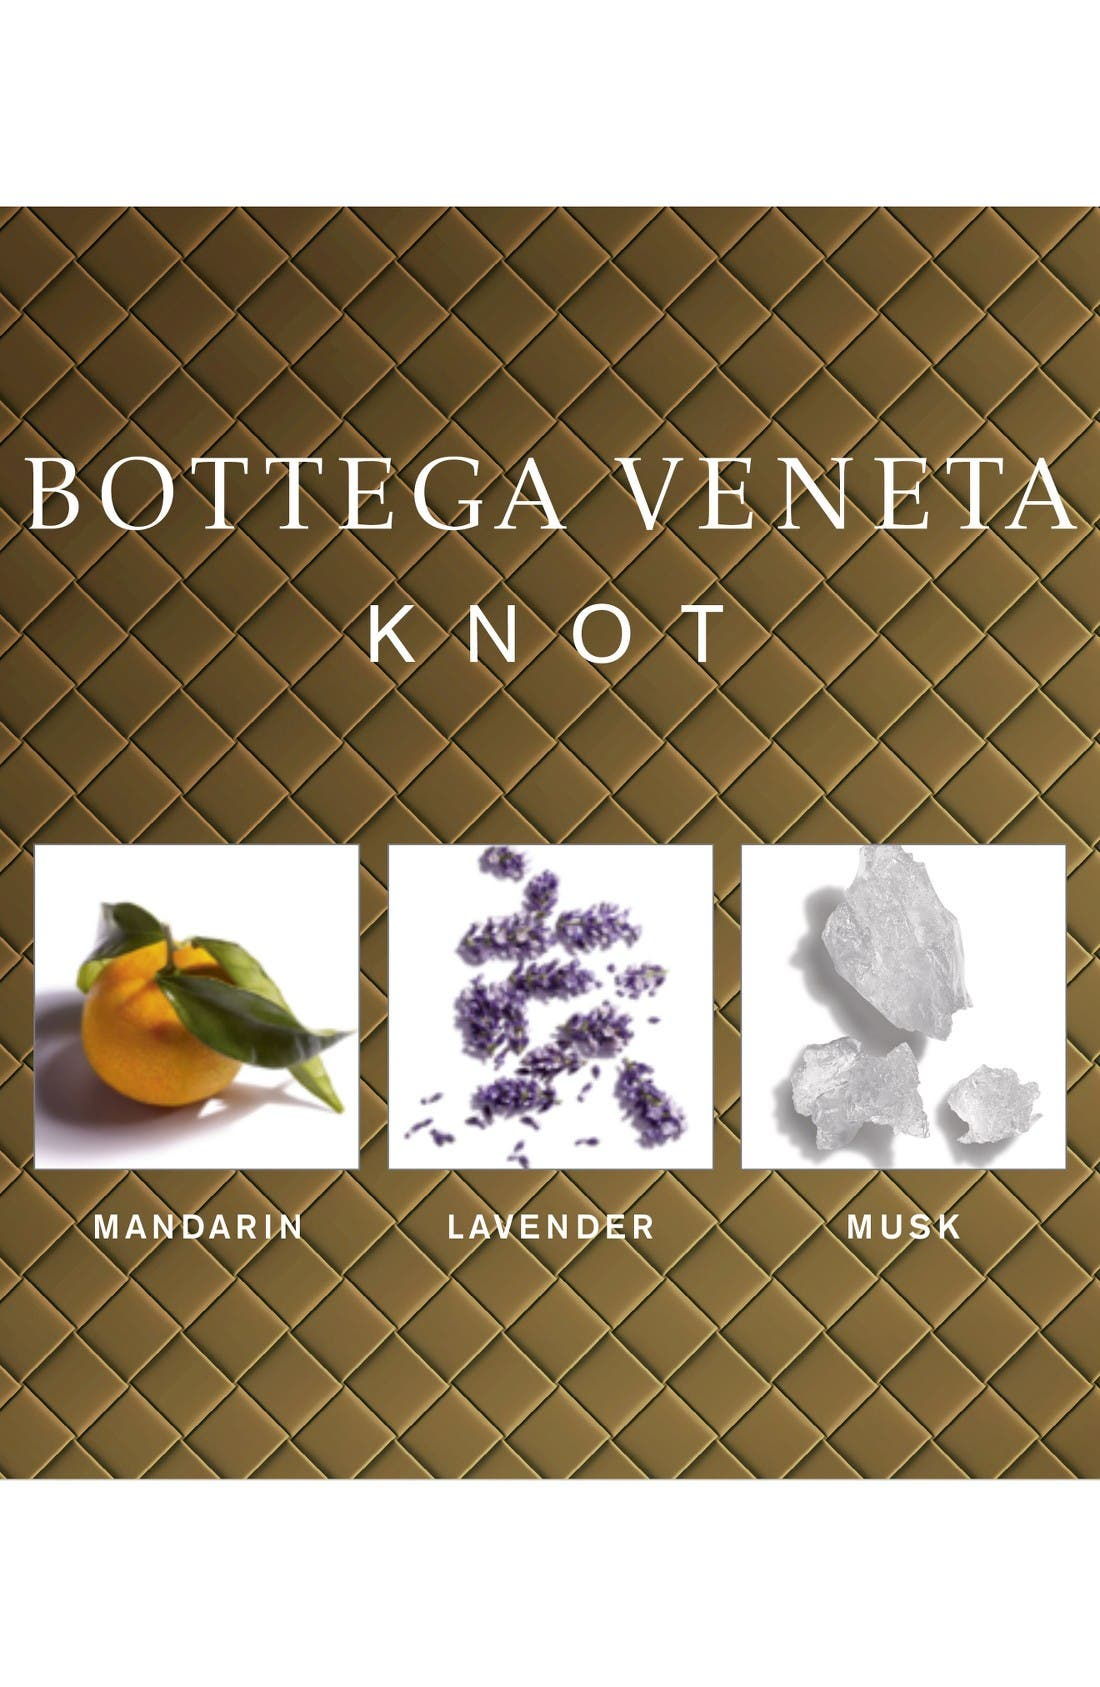 Alternate Image 3  - Bottega Veneta 'Knot' Eau de Parfum Spray